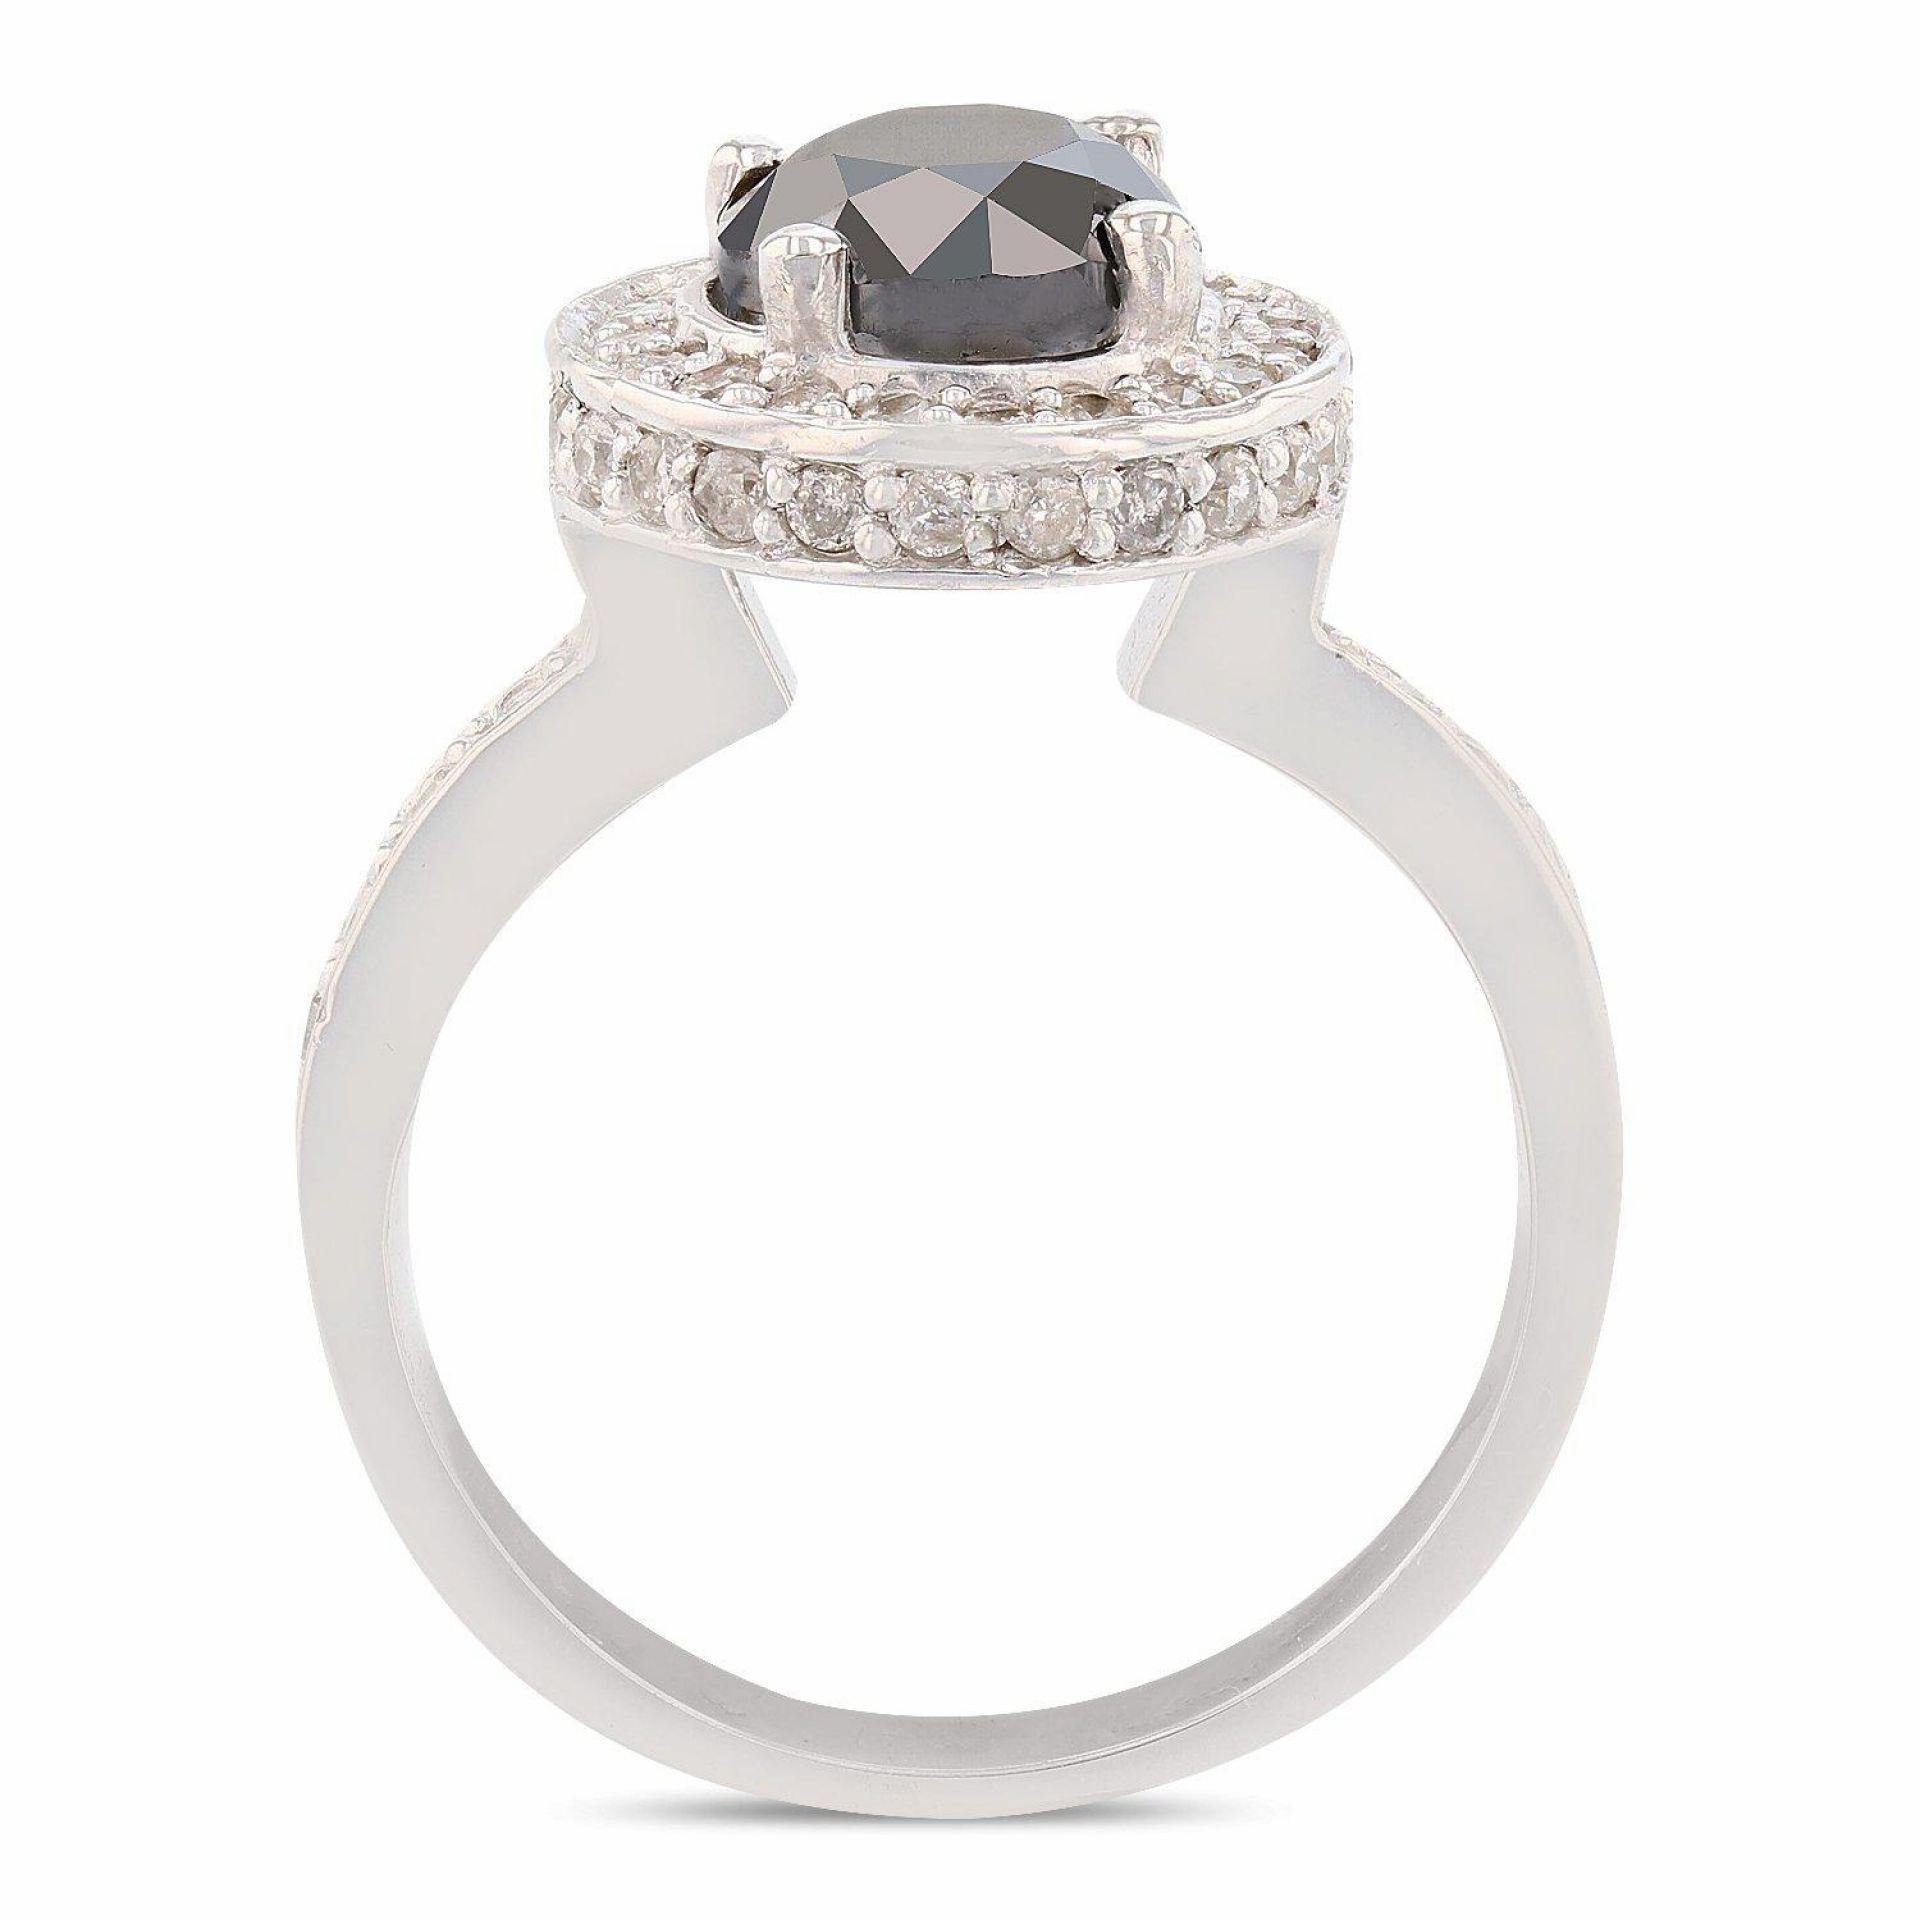 1.77ct CENTER Fancy Black Diamond 14K White Gold Ring (2.37ctw Diamonds)